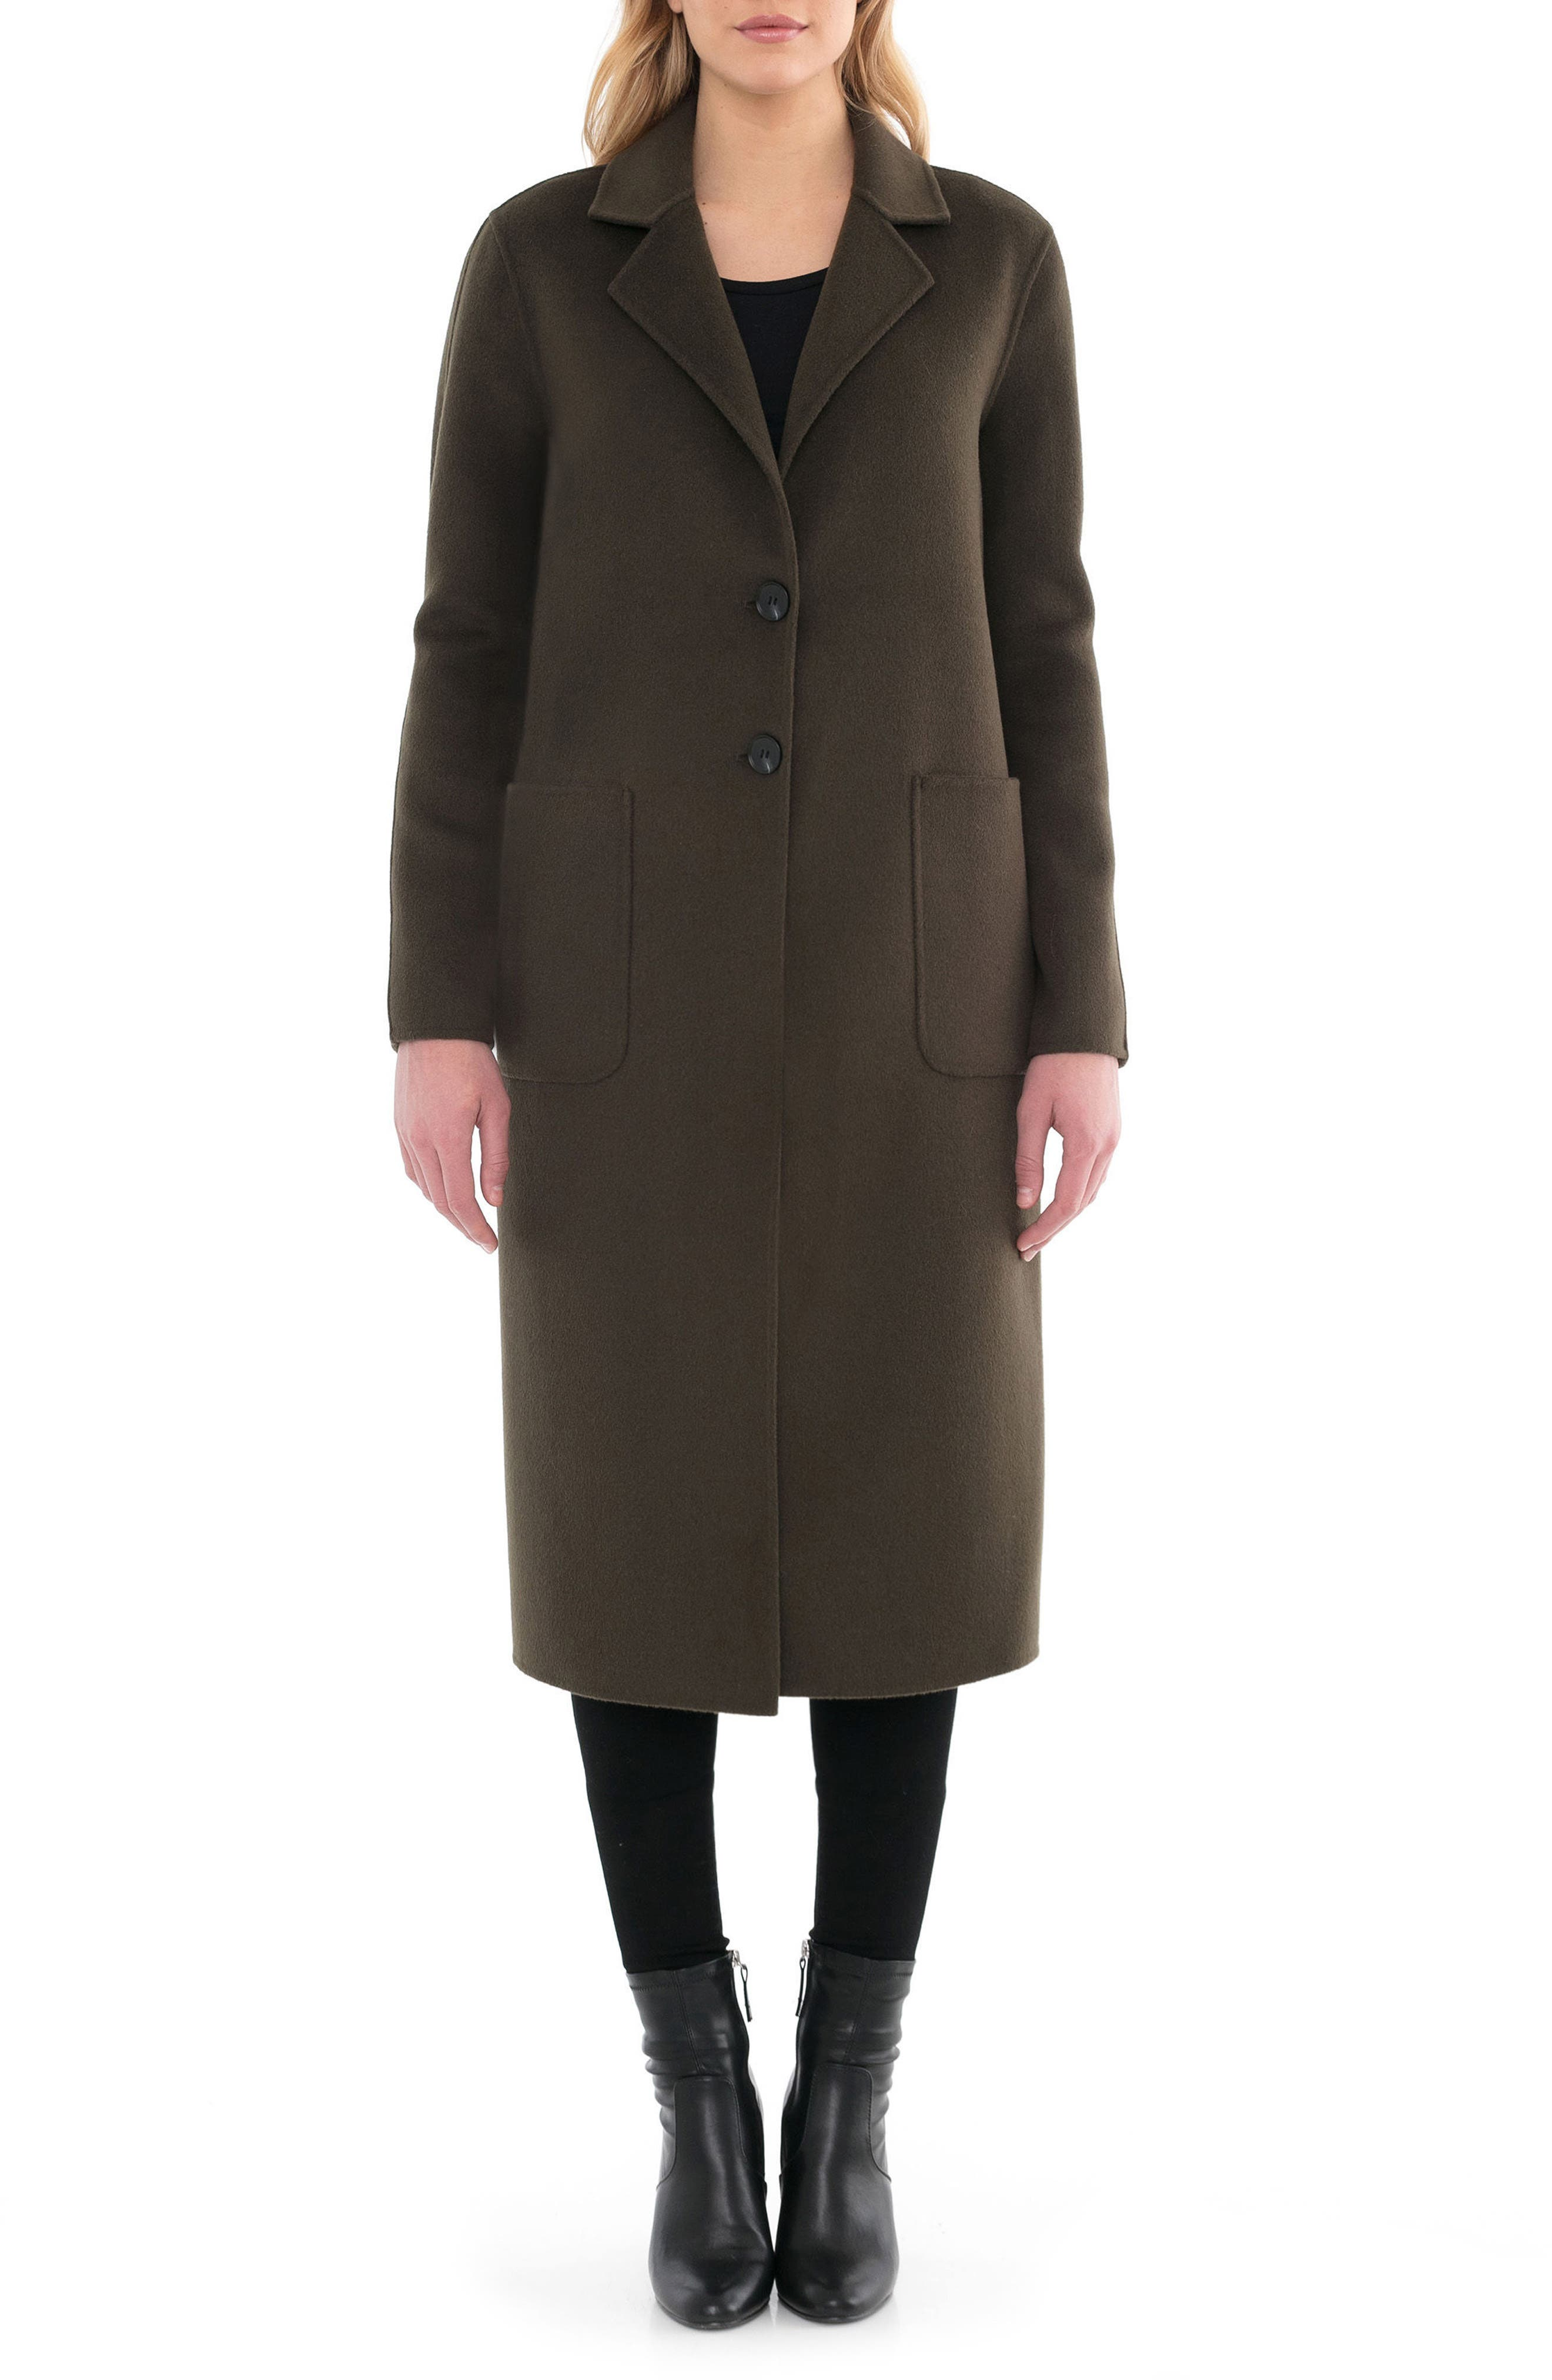 Badgley Mischka Courtney Double Face Wool Blend Long Coat